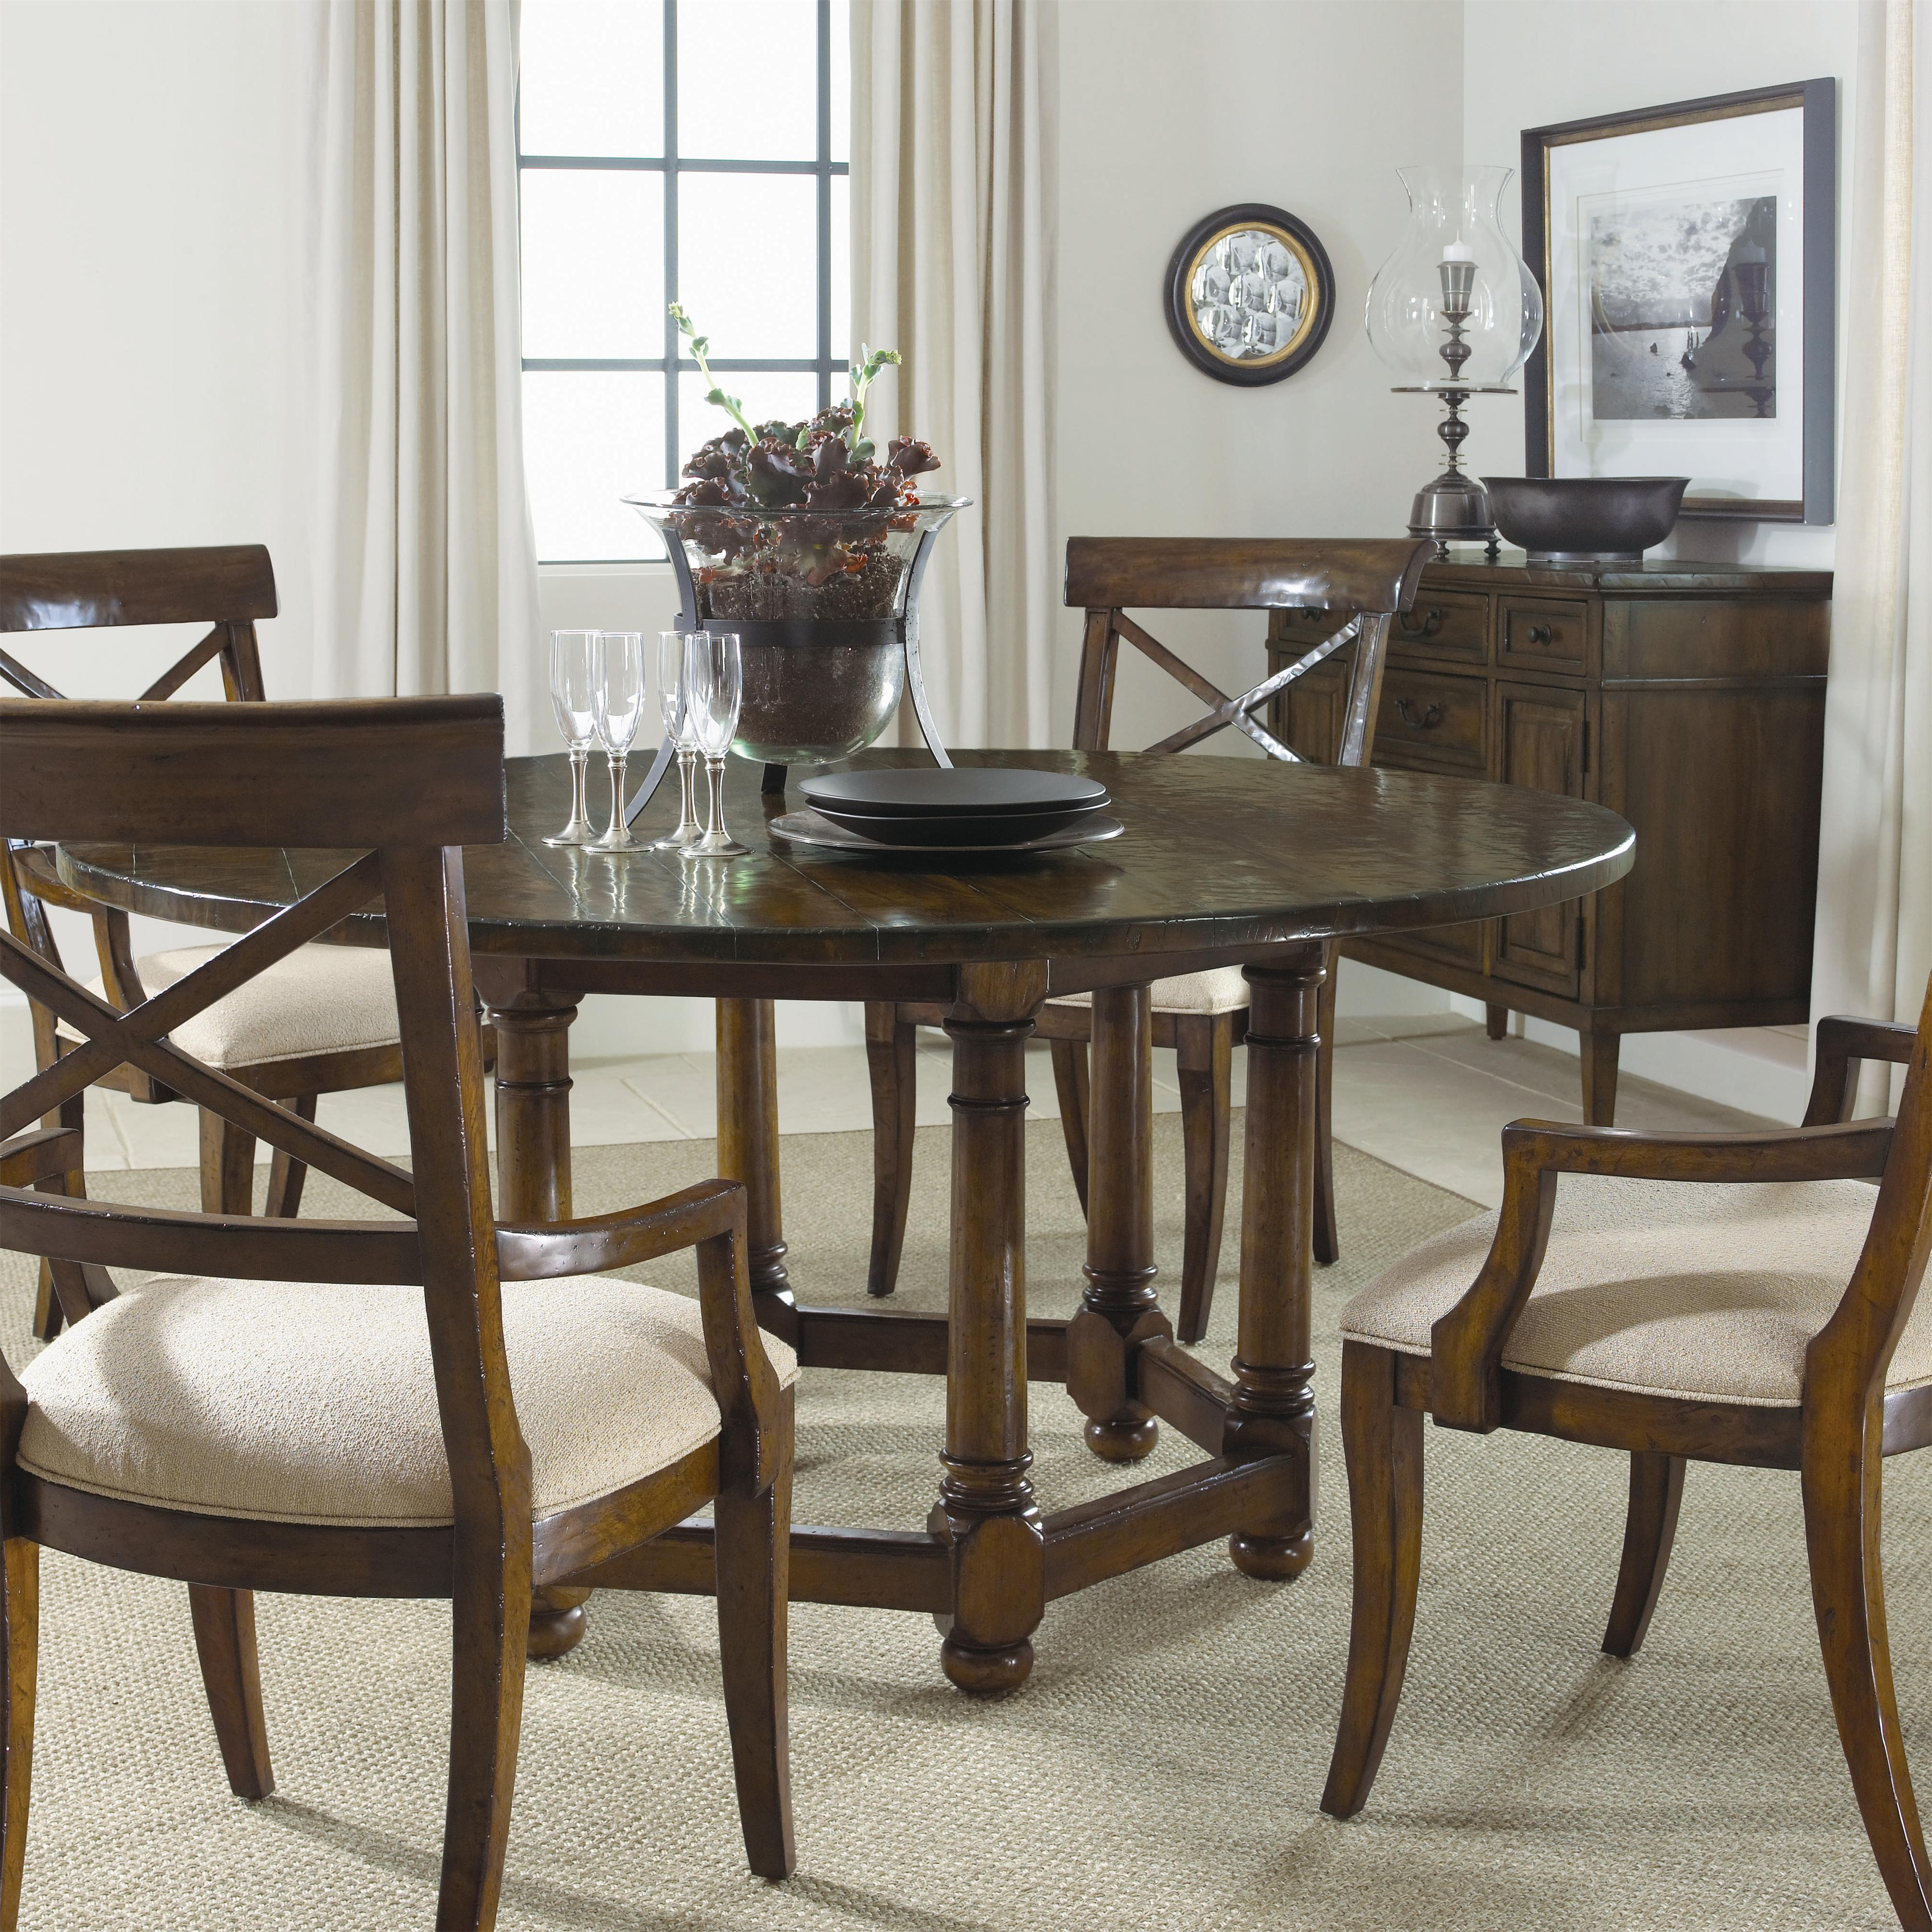 "Vintage Dining Room Table: Bernhardt Vintage Patina 62"" Round Dining Room Table"